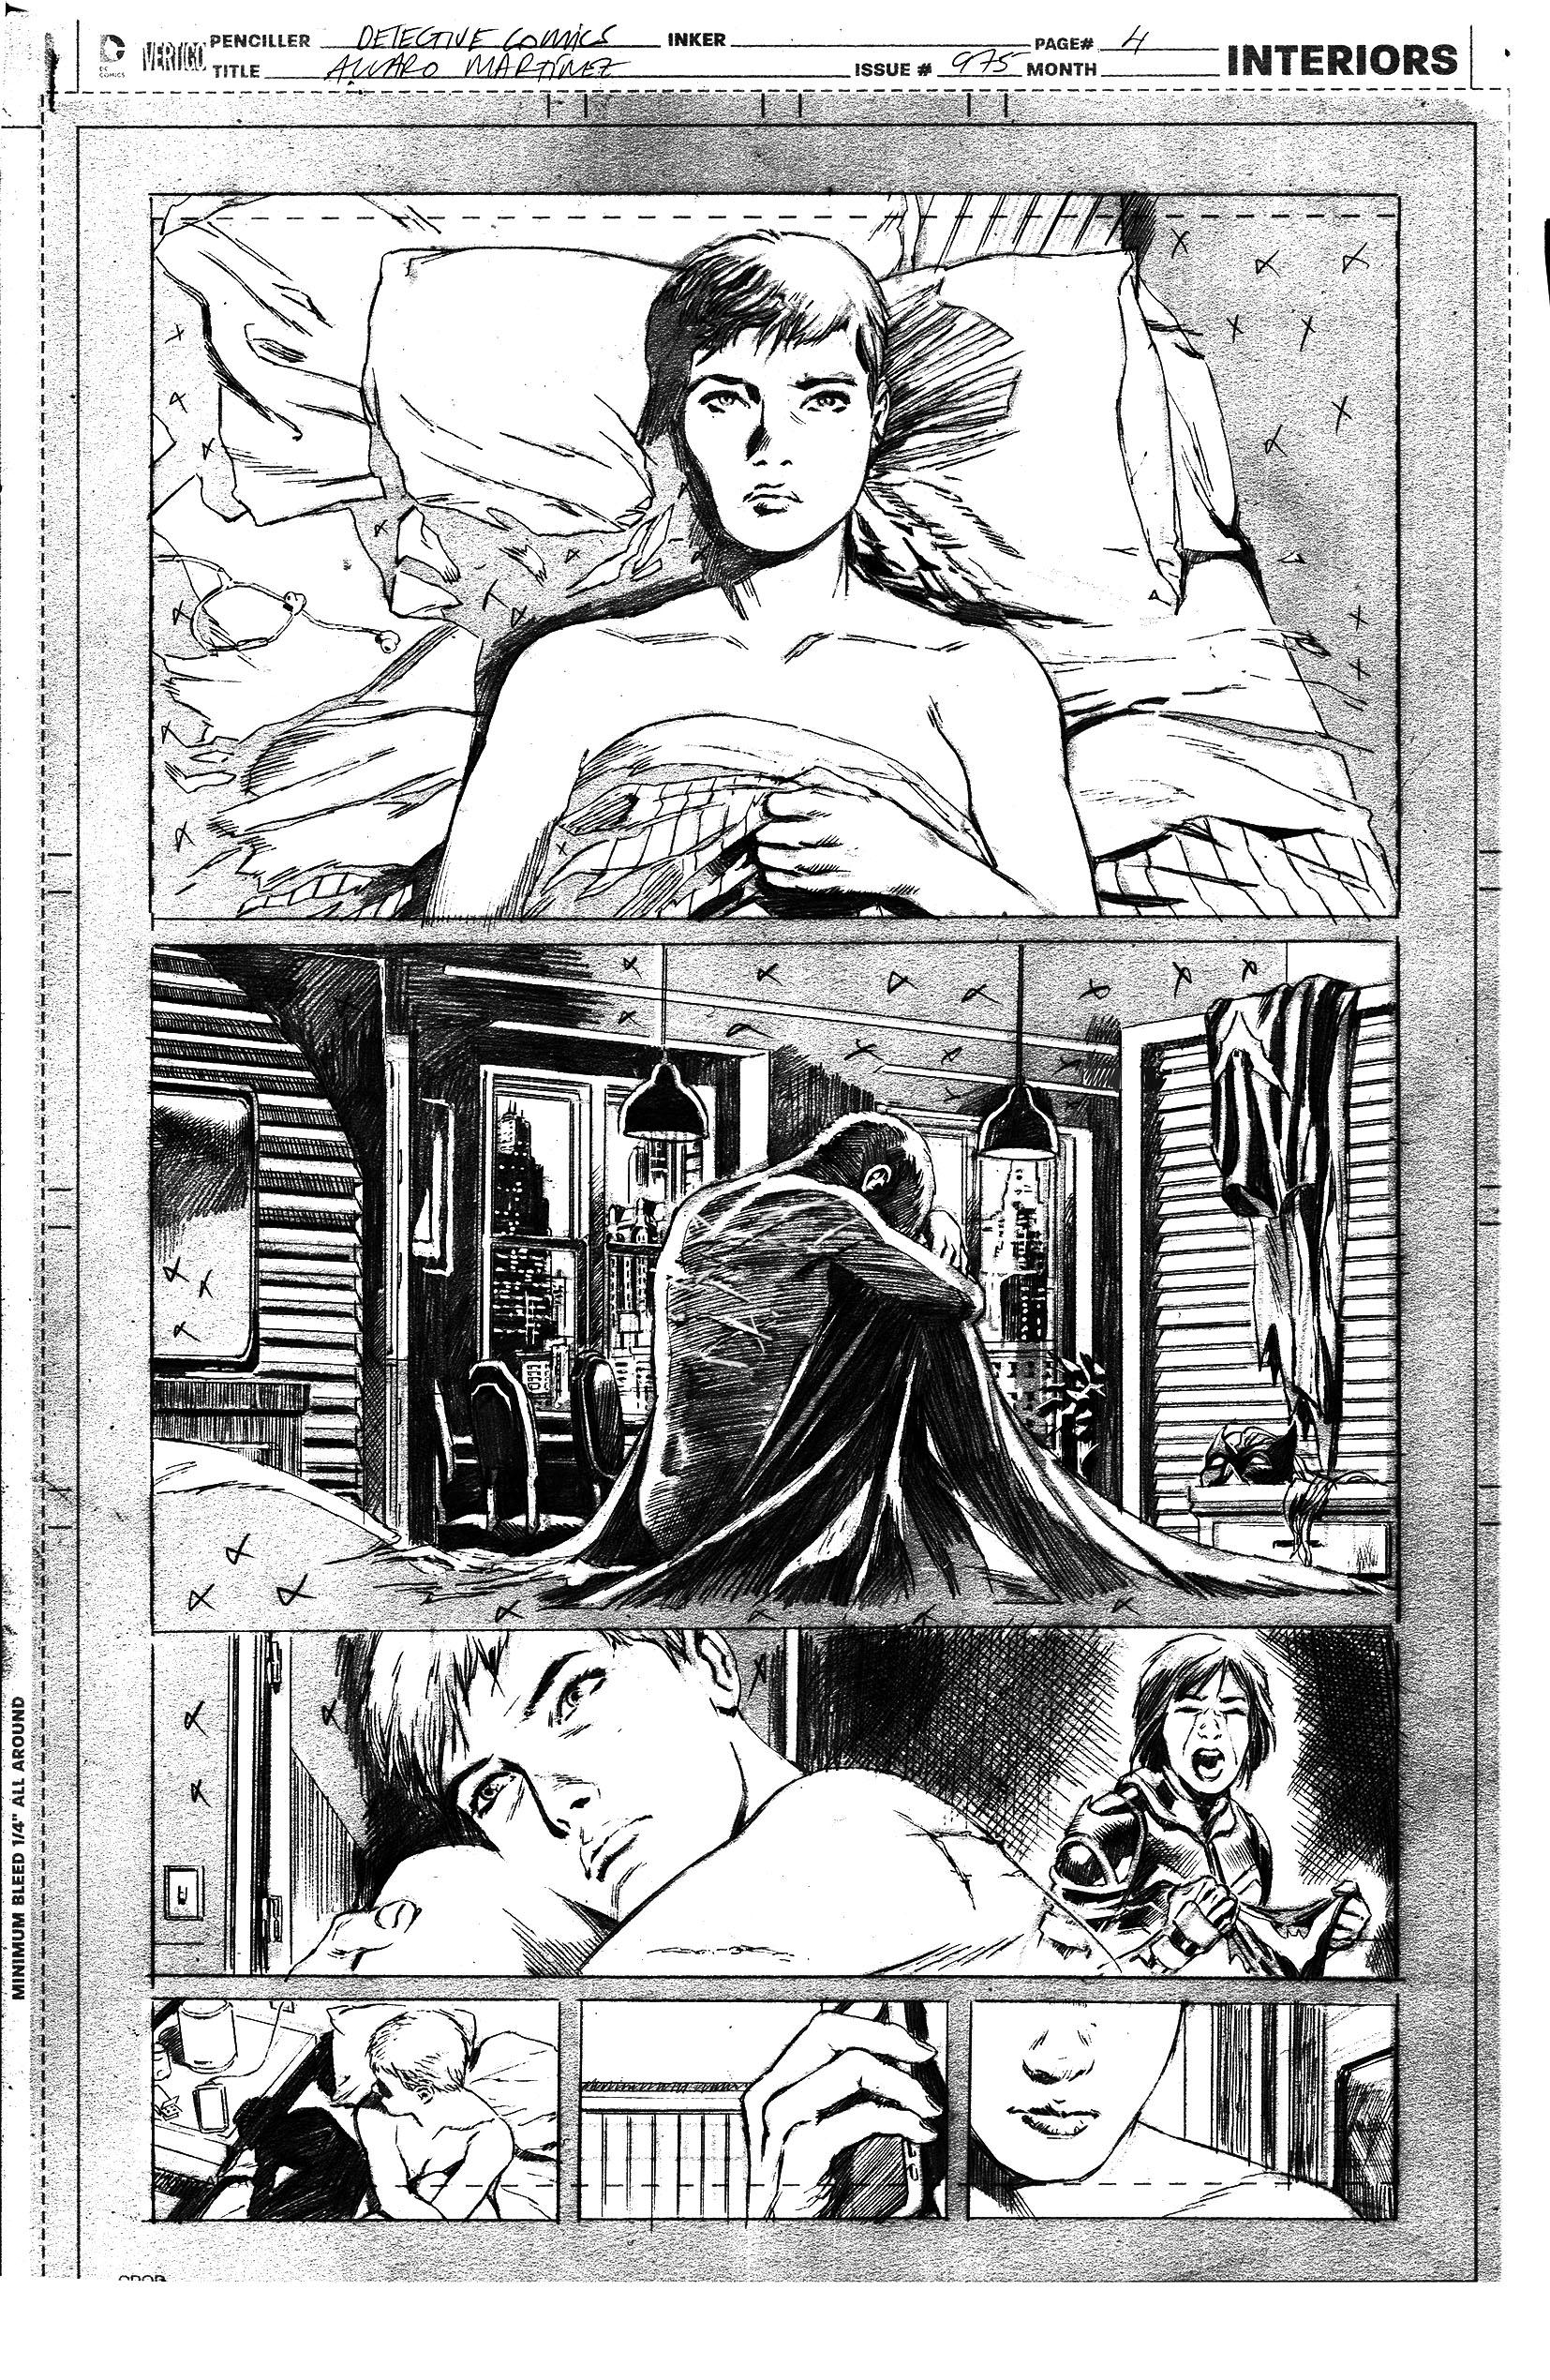 Detective Comics #975 page 5